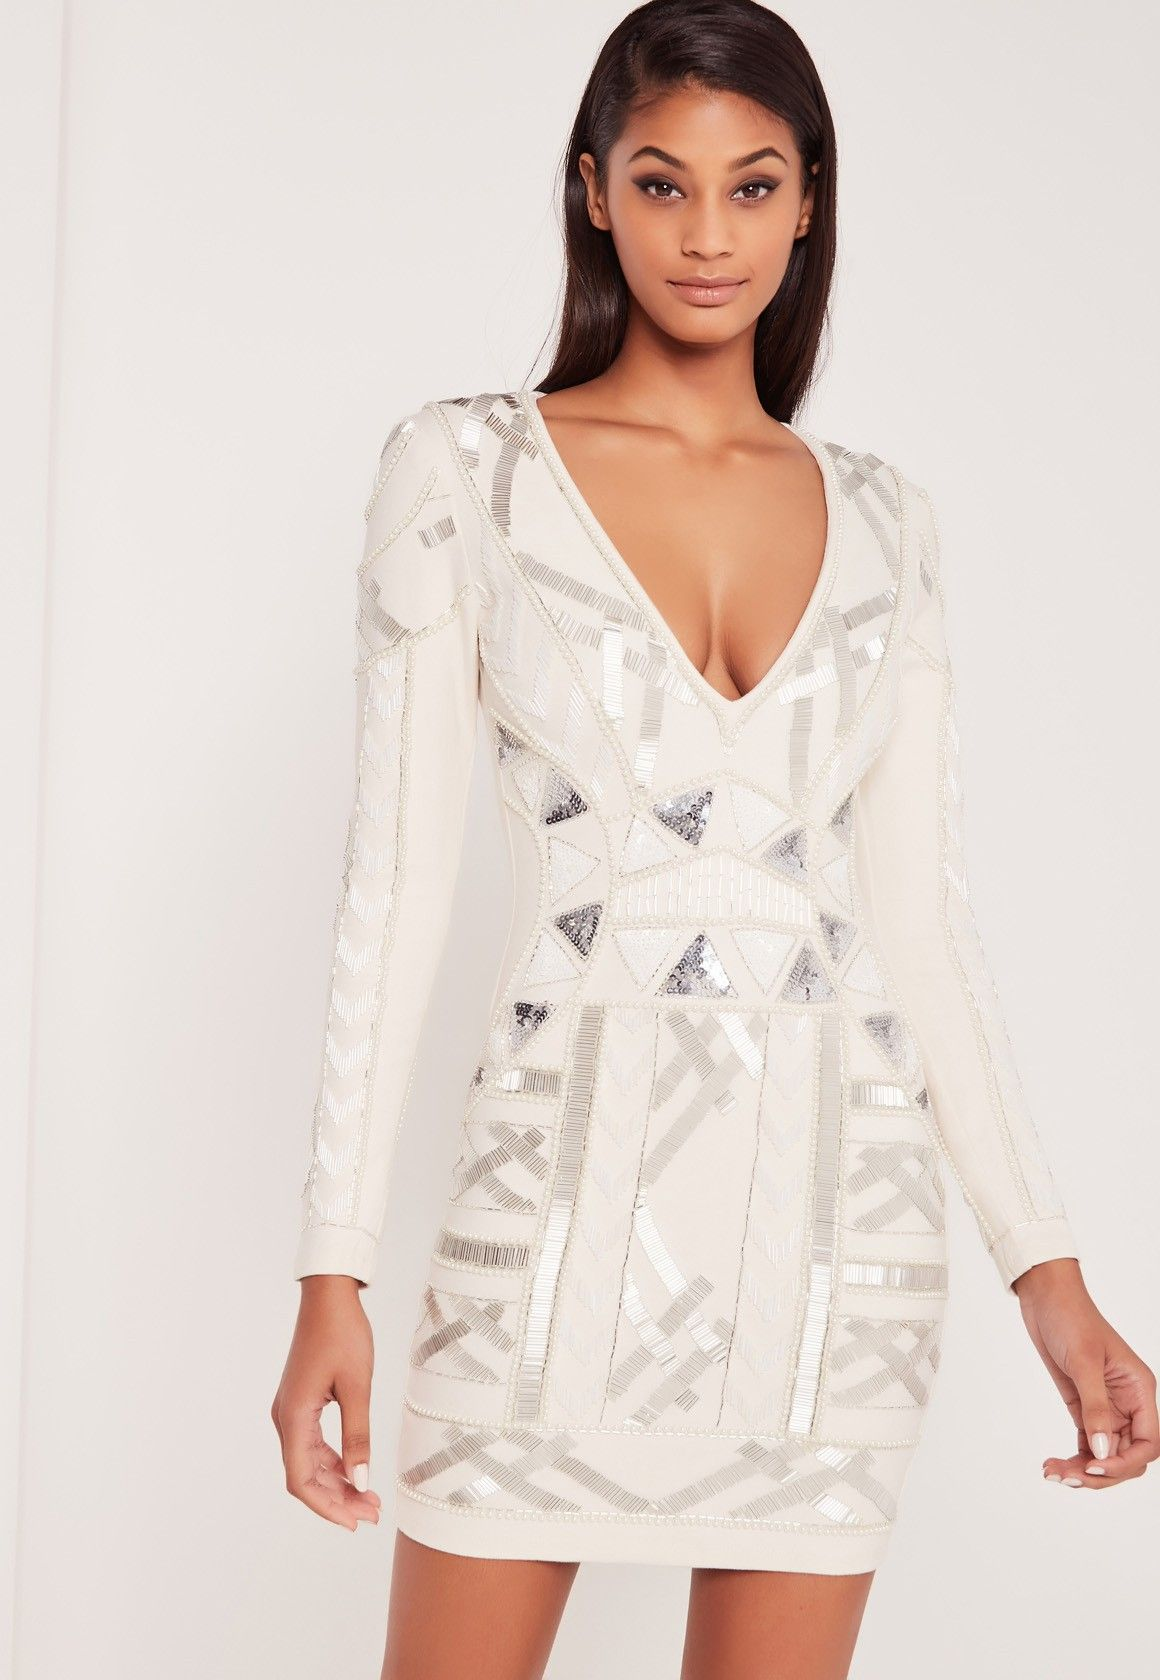 Carli Bybel Embellished Plunge Bodycon Dress White